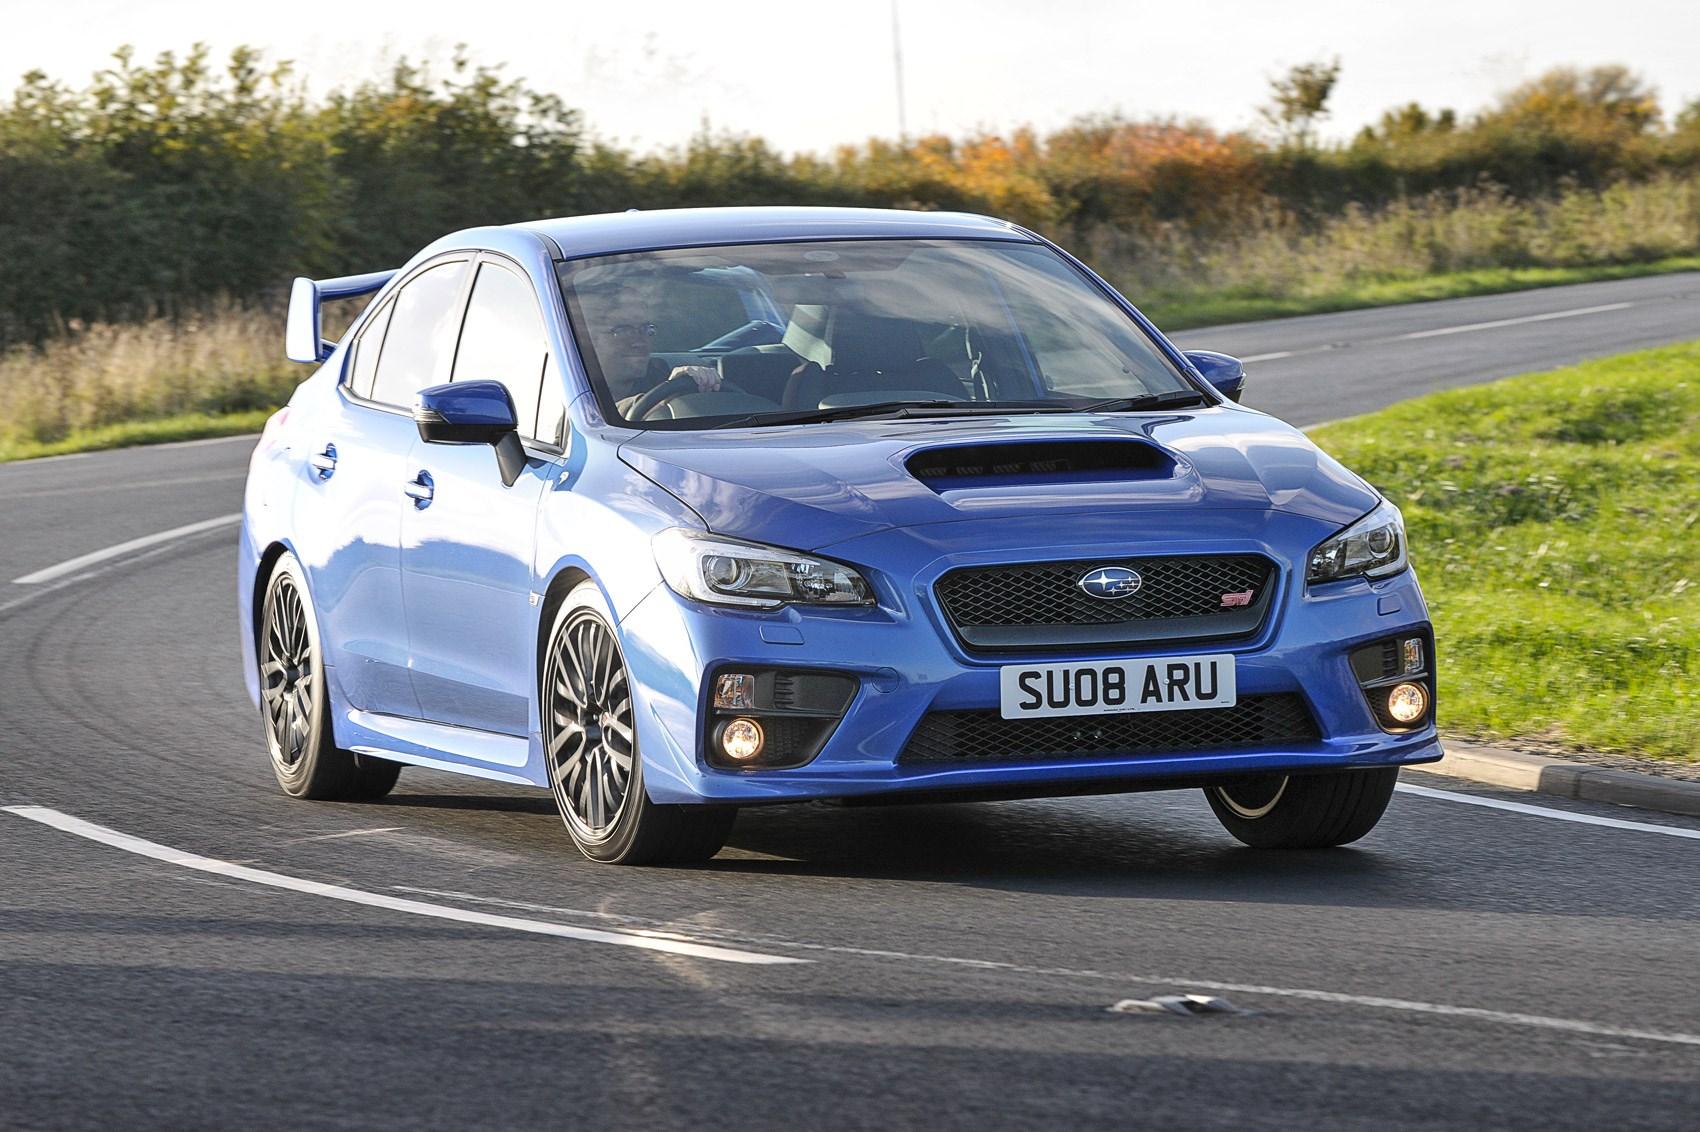 Subaru WRX STI (2016) Long-term Test Review By CAR Magazine